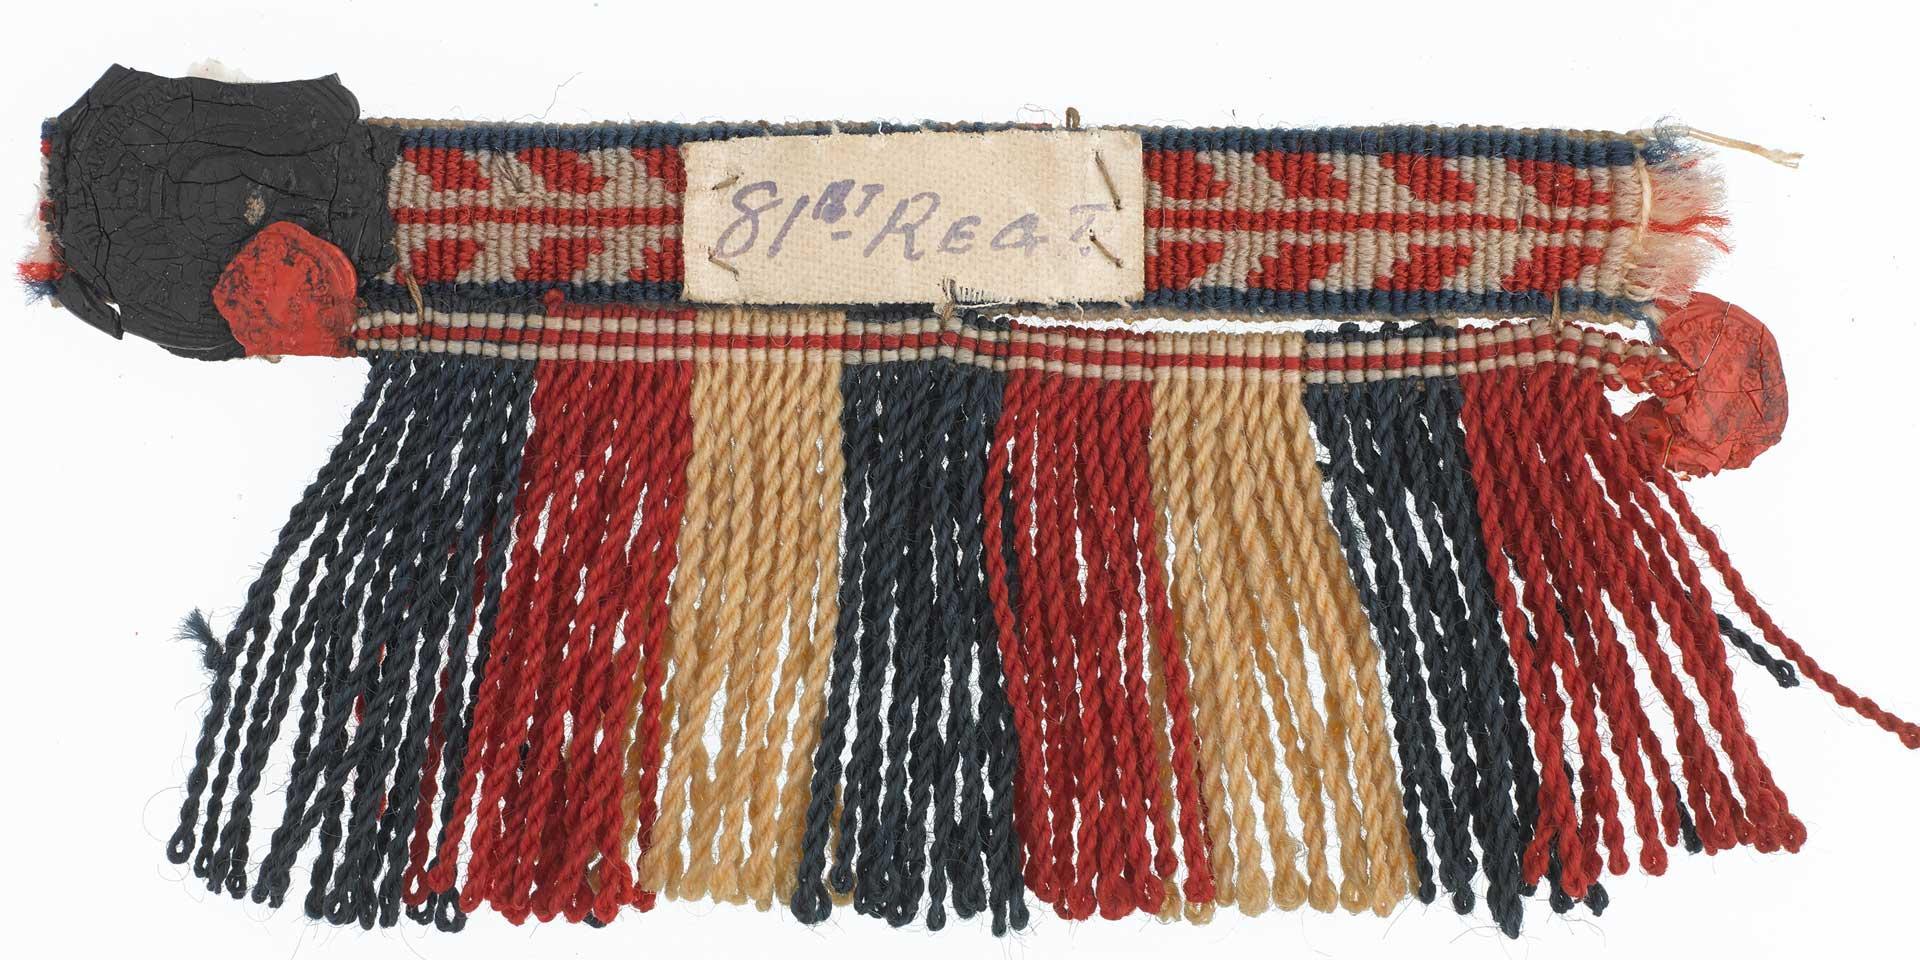 Lace and fringe sample, drummer, 81st (Loyal Lincoln Volunteers) Regiment of Foot, sealed pattern, 1860